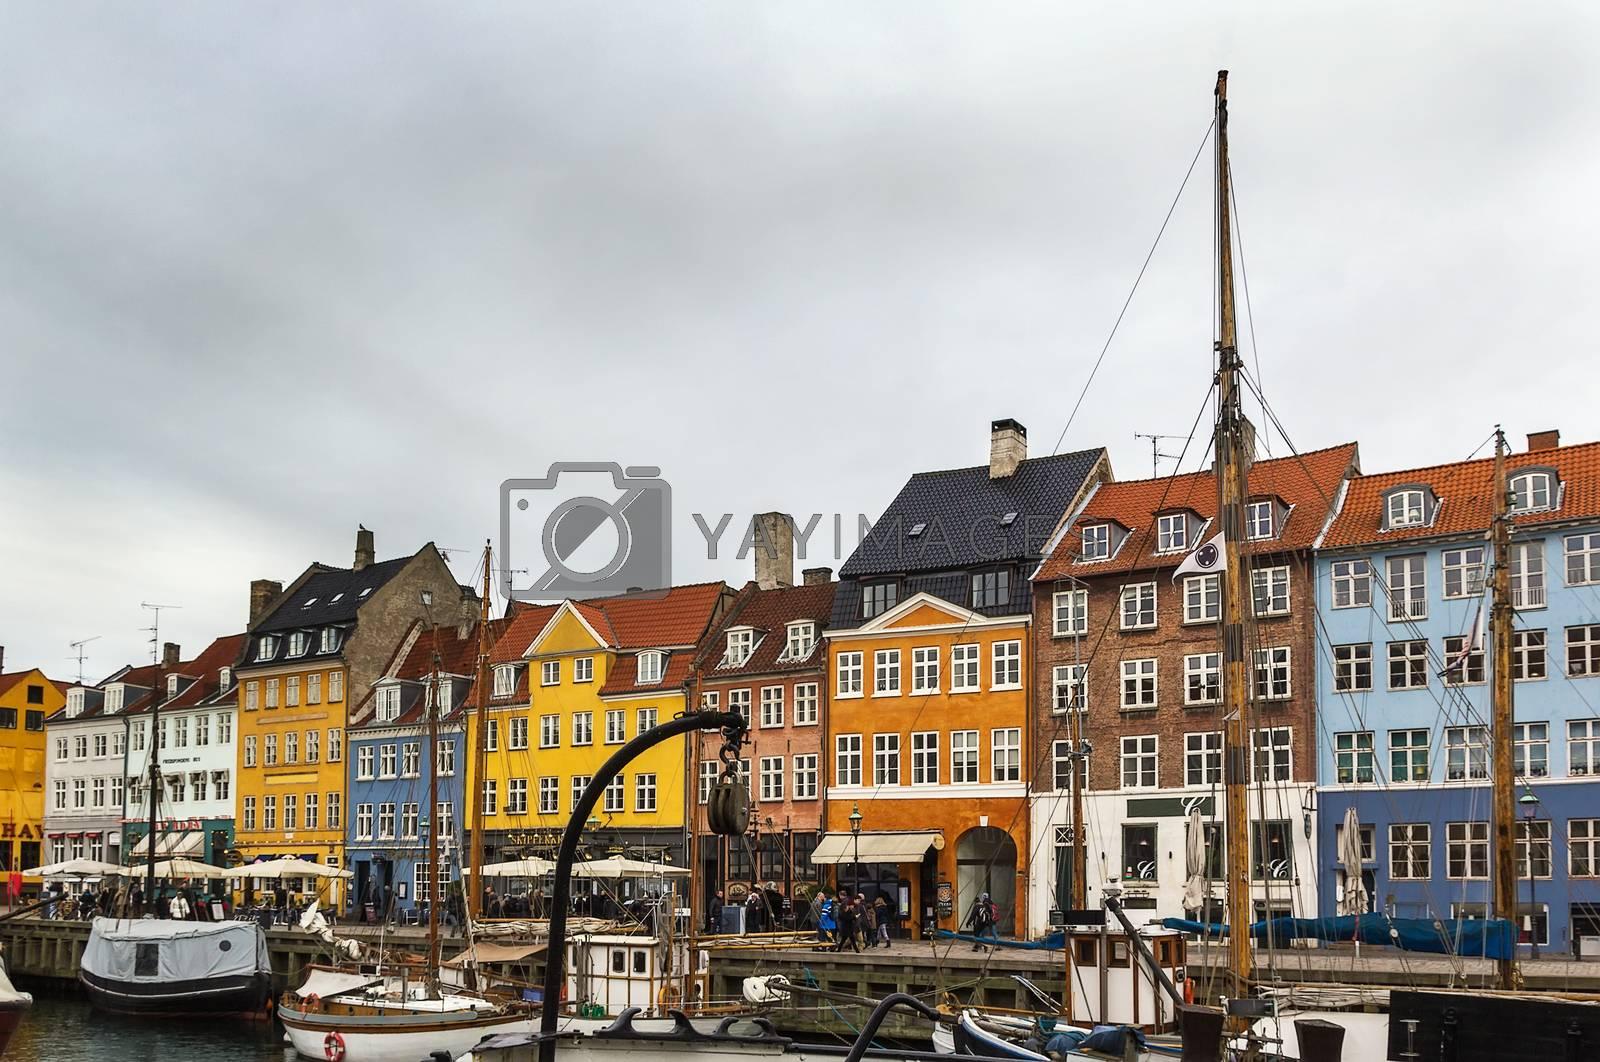 Nyhavn, Copenhagen by borisb17